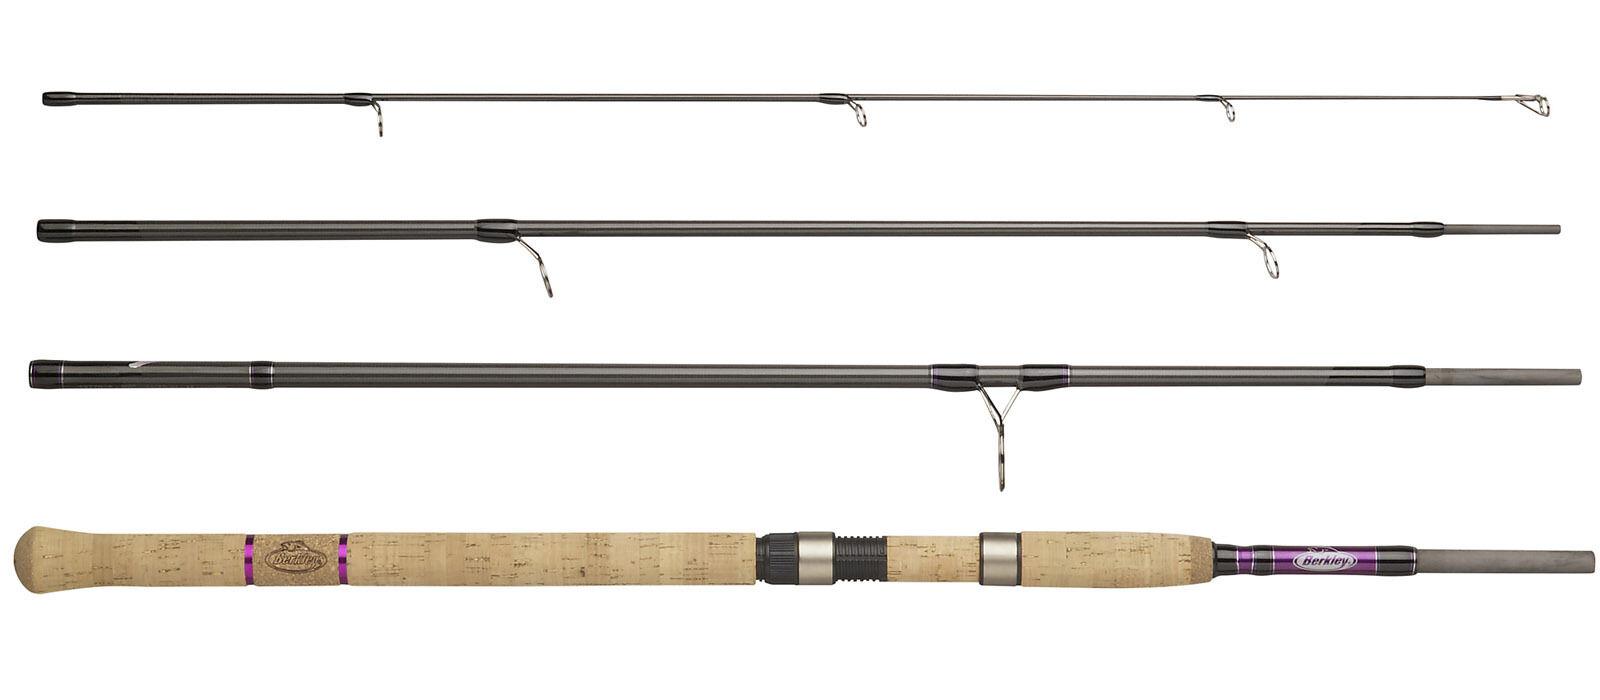 Berkley Phazer Pro II Spin 2 4 piece 7ft 8ft 9ft Fishing Rod